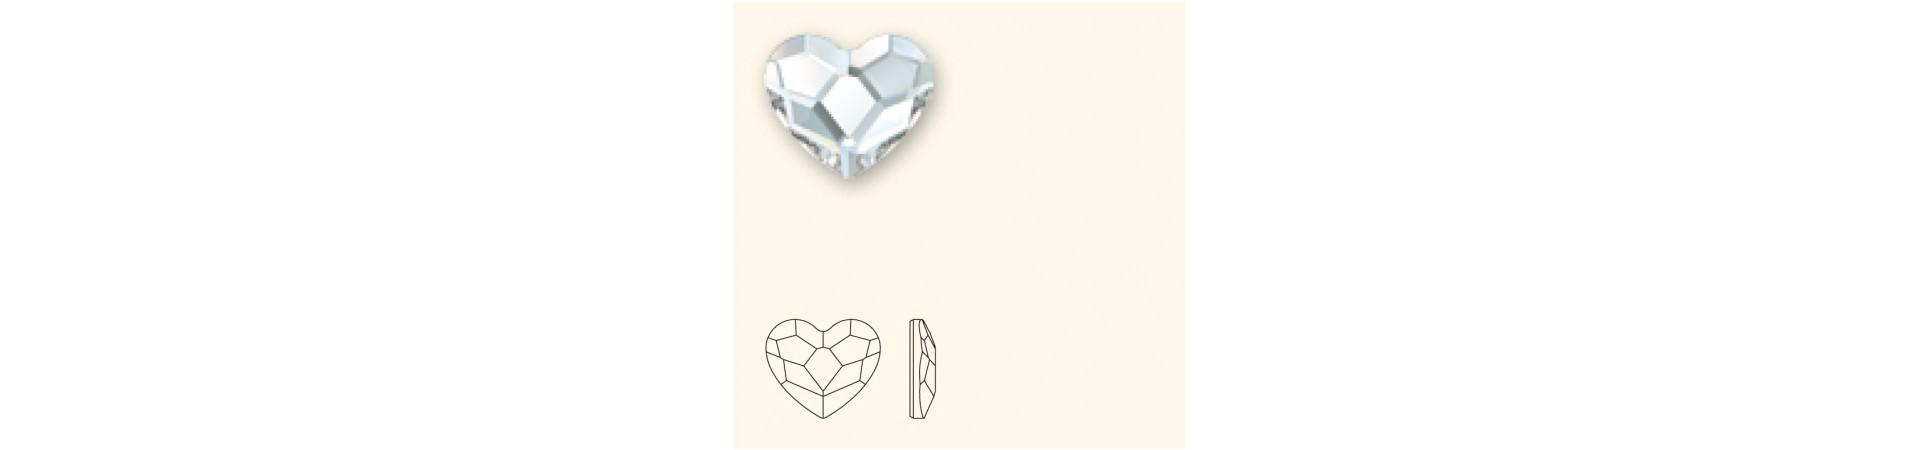 2808 Сердце (Heart) с плоским основанием